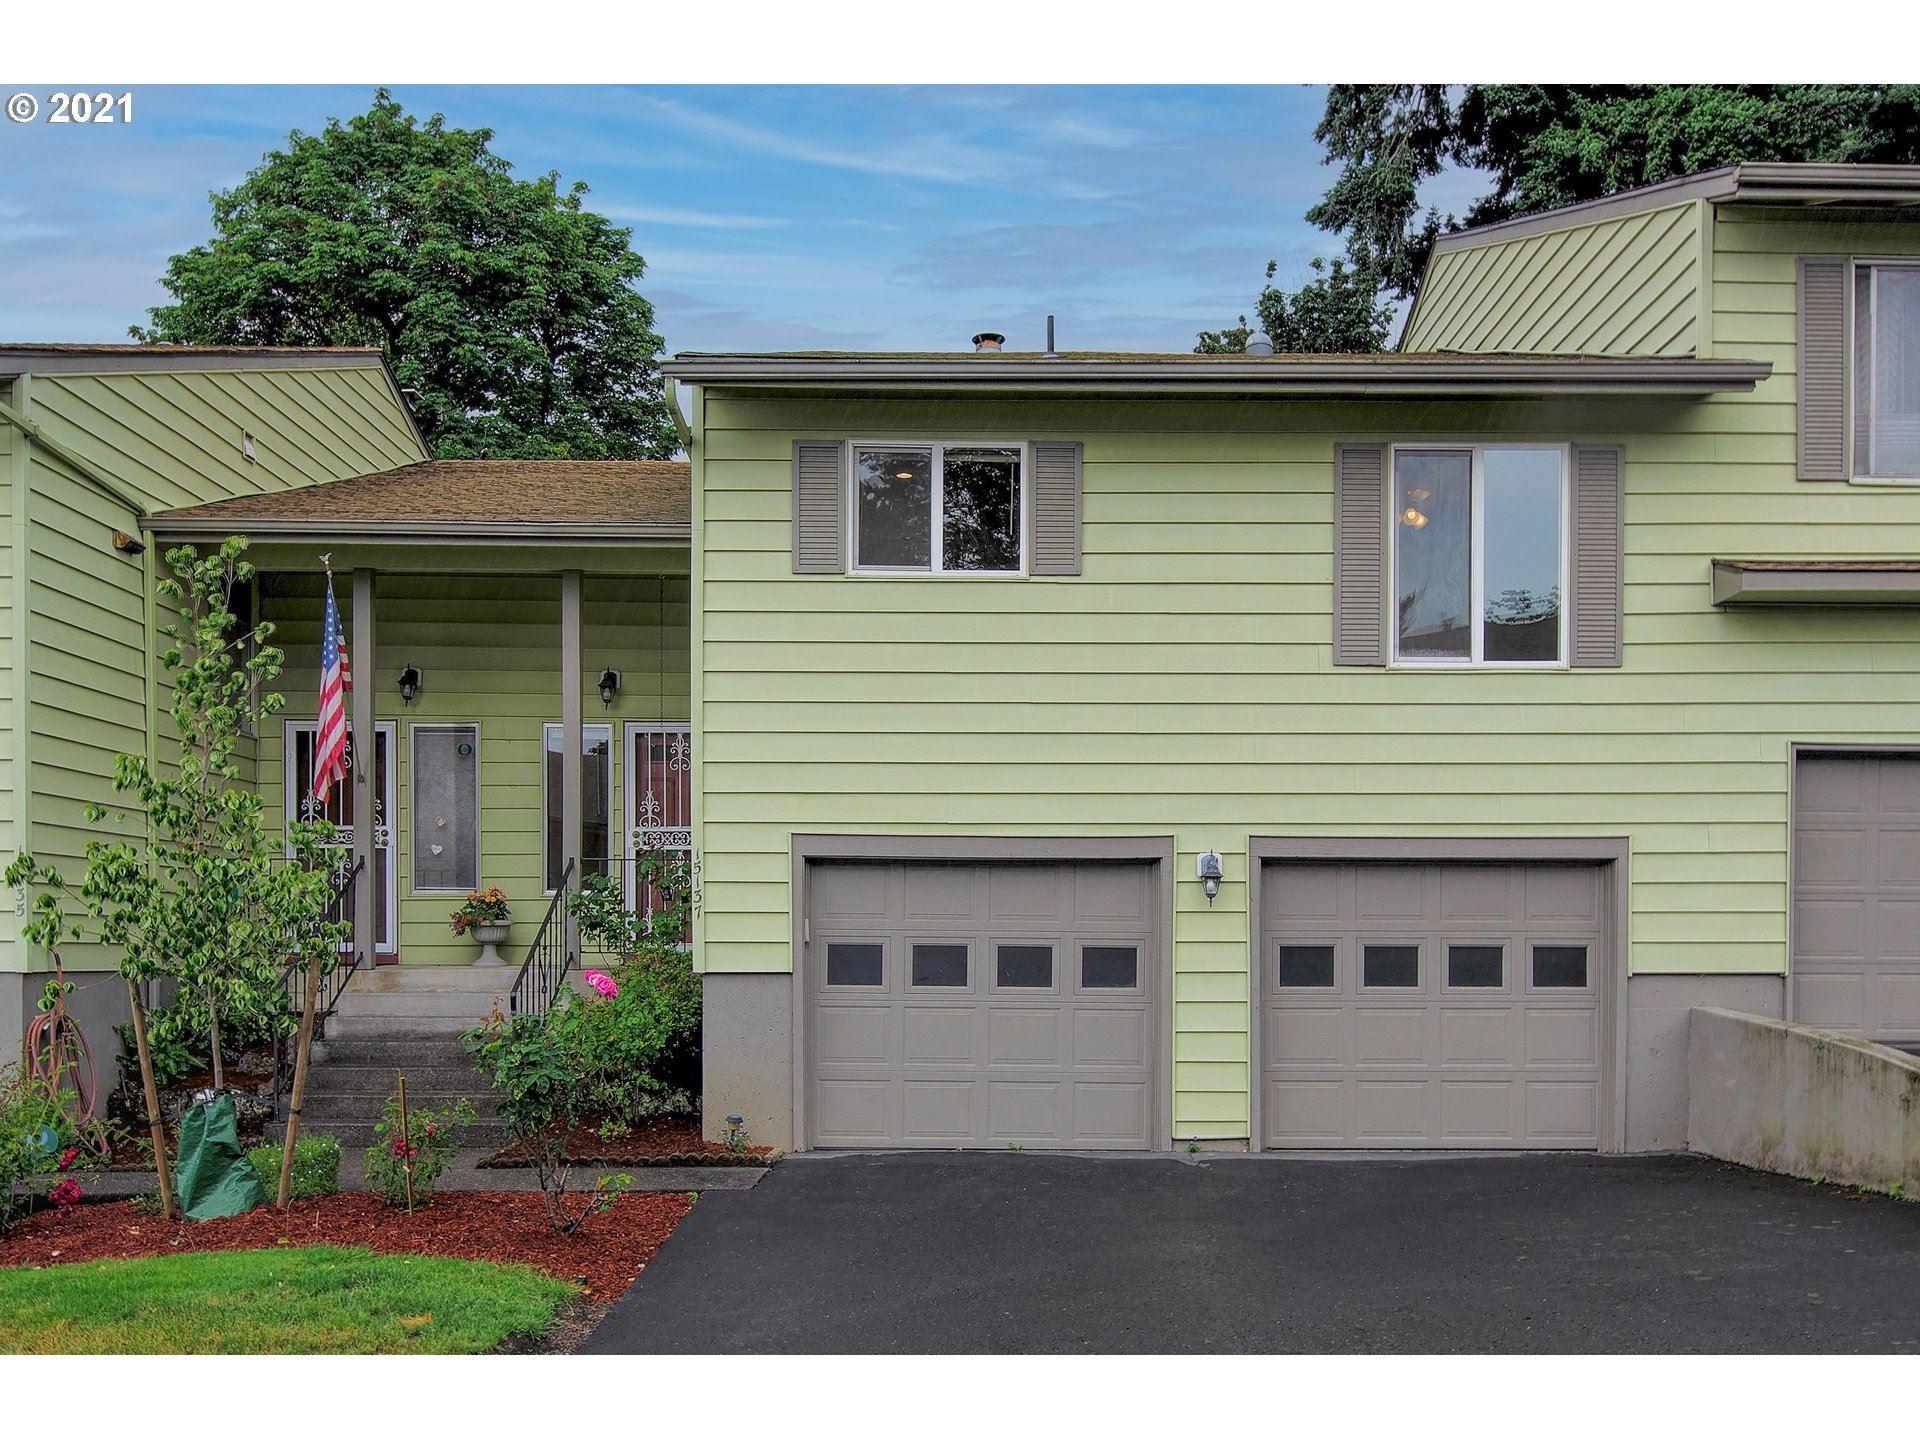 15137 NE ROSE PKWY, Portland, OR 97230 - MLS#: 21408133